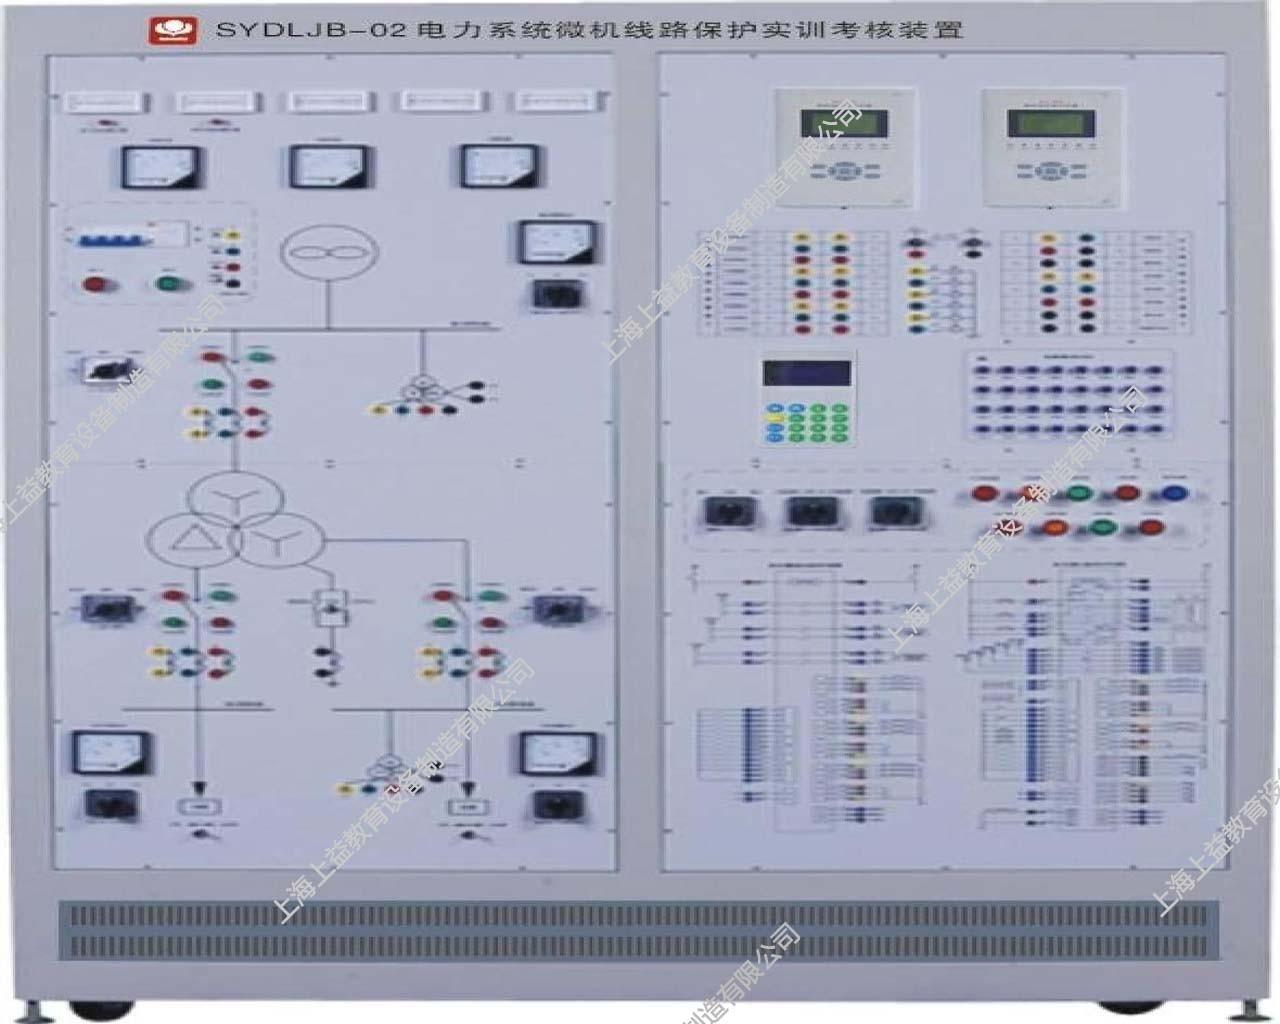 SYDLJB-02电力系统微机线路保护wwwlehu8viplehu68vip装置